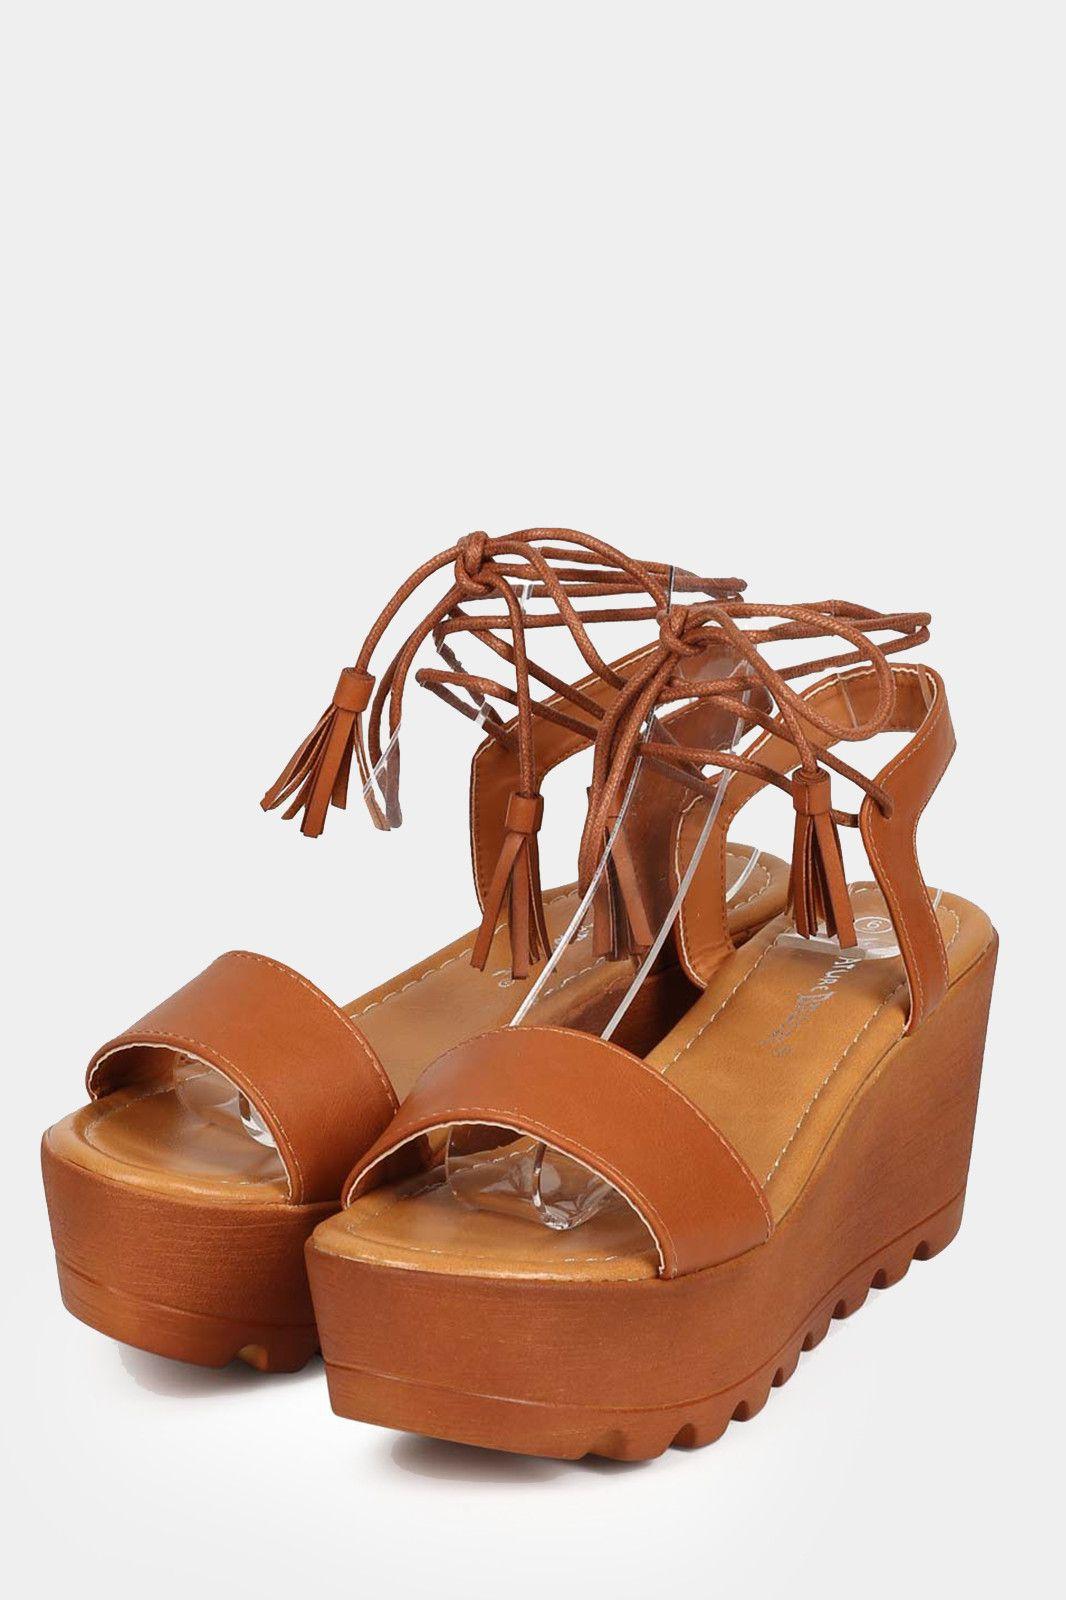 a455c1bbdd7 Wrap Wooden Platform Wedge Sandals - Tan - Bare Feet Shoes - 3 ...